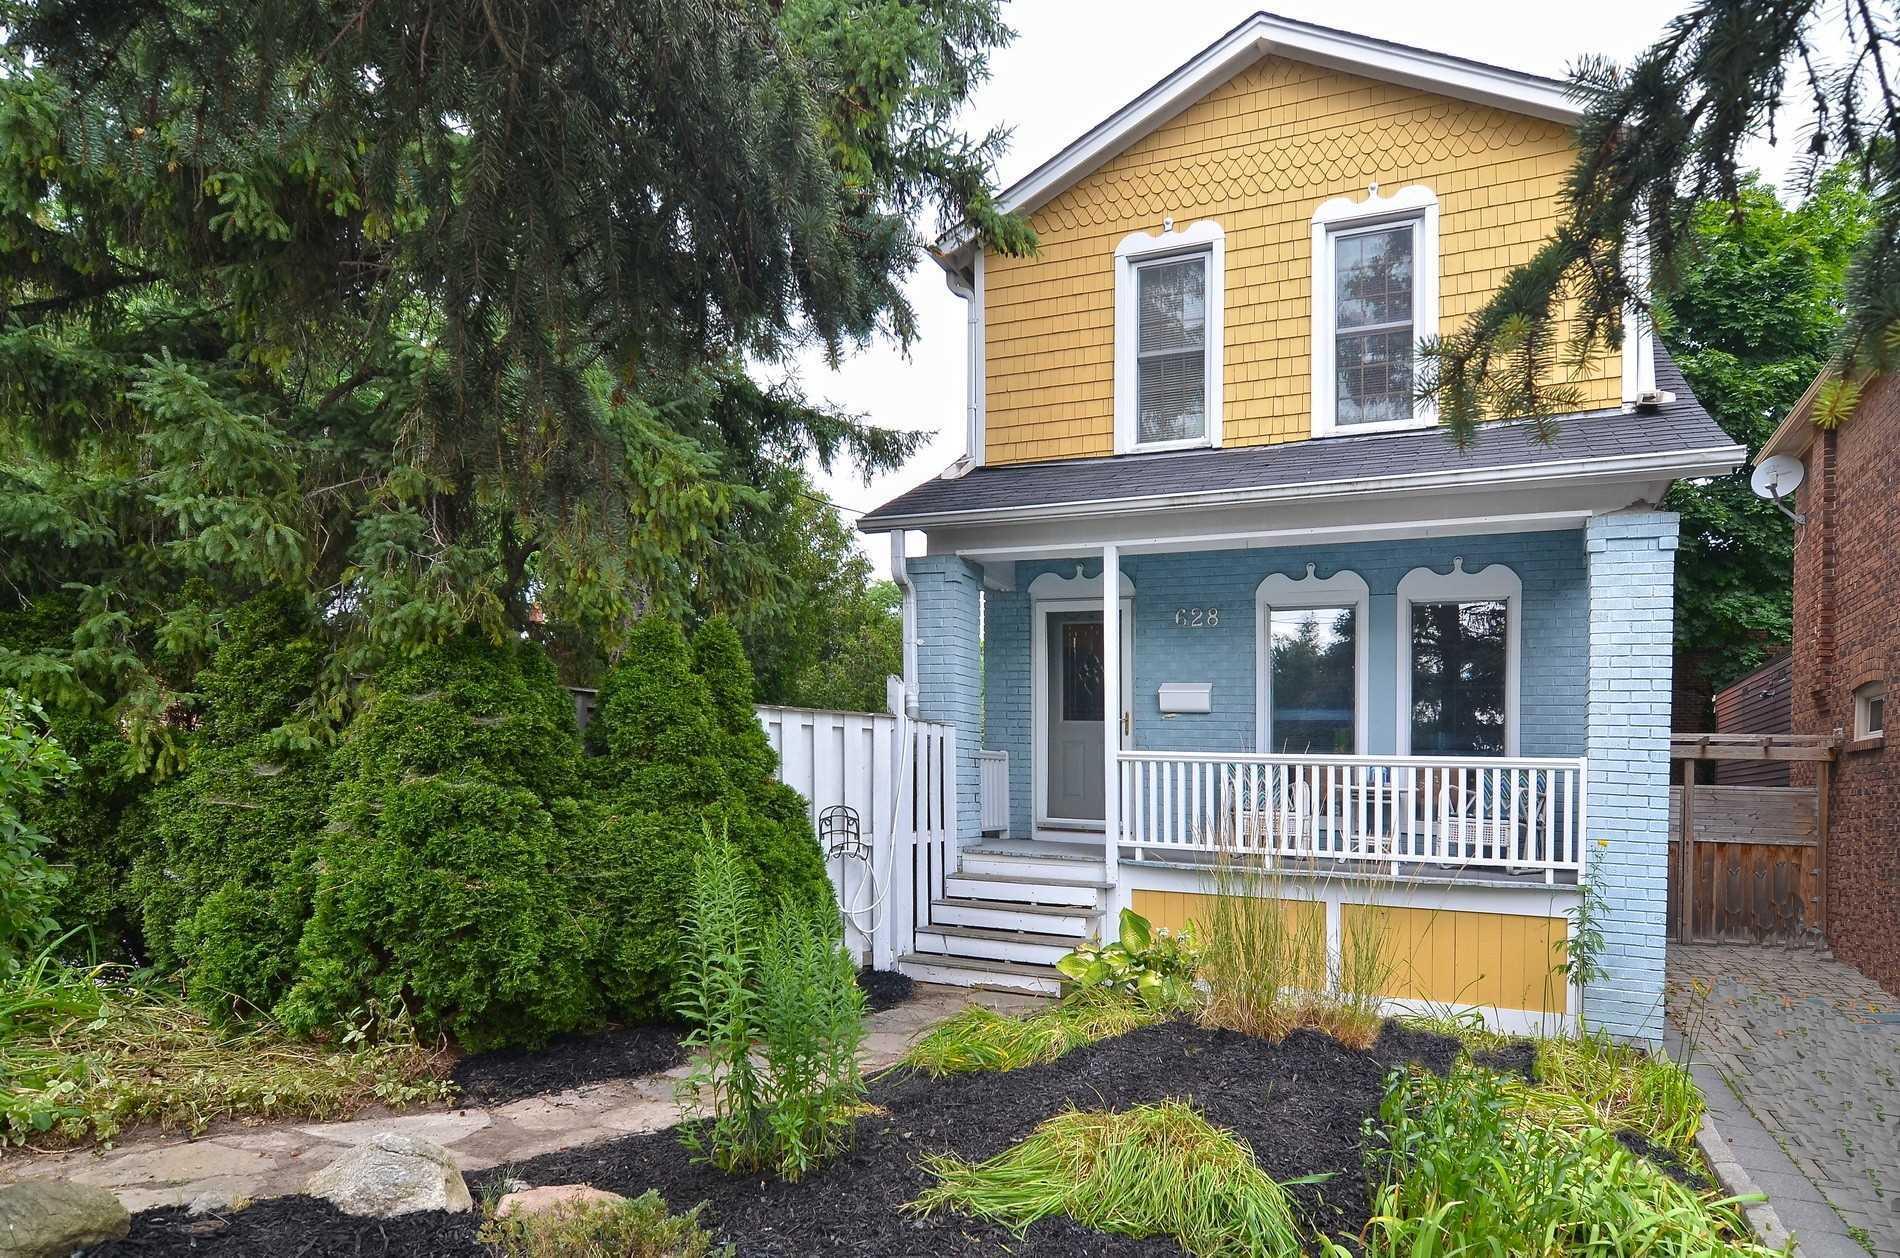 628 Hillsdale Ave, Toronto, Ontario M4S1V3, 3 Bedrooms Bedrooms, 7 Rooms Rooms,2 BathroomsBathrooms,Detached,For Sale,Hillsdale,C4843808